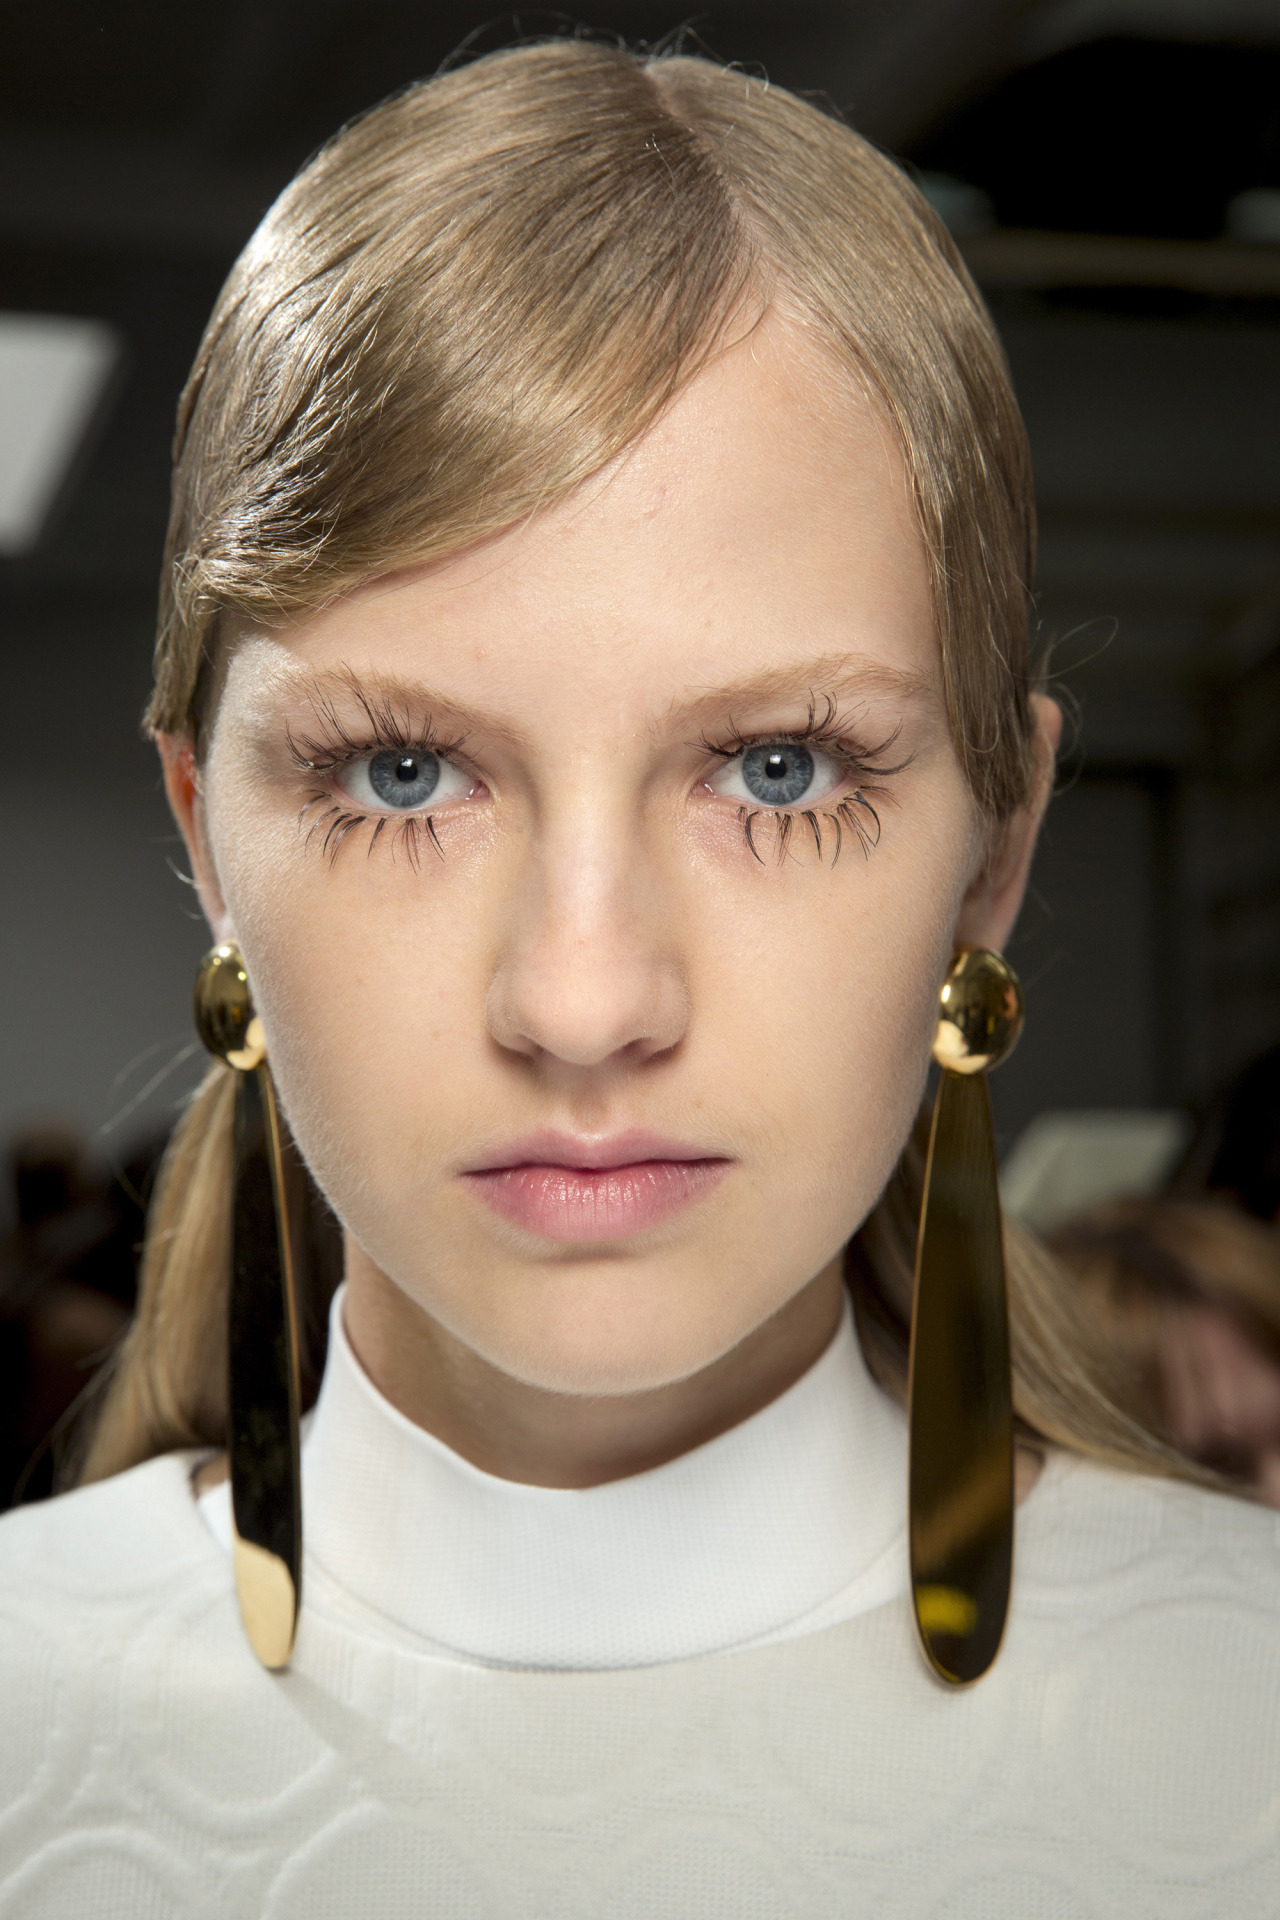 fashionwonderer-gold-earrings (32)